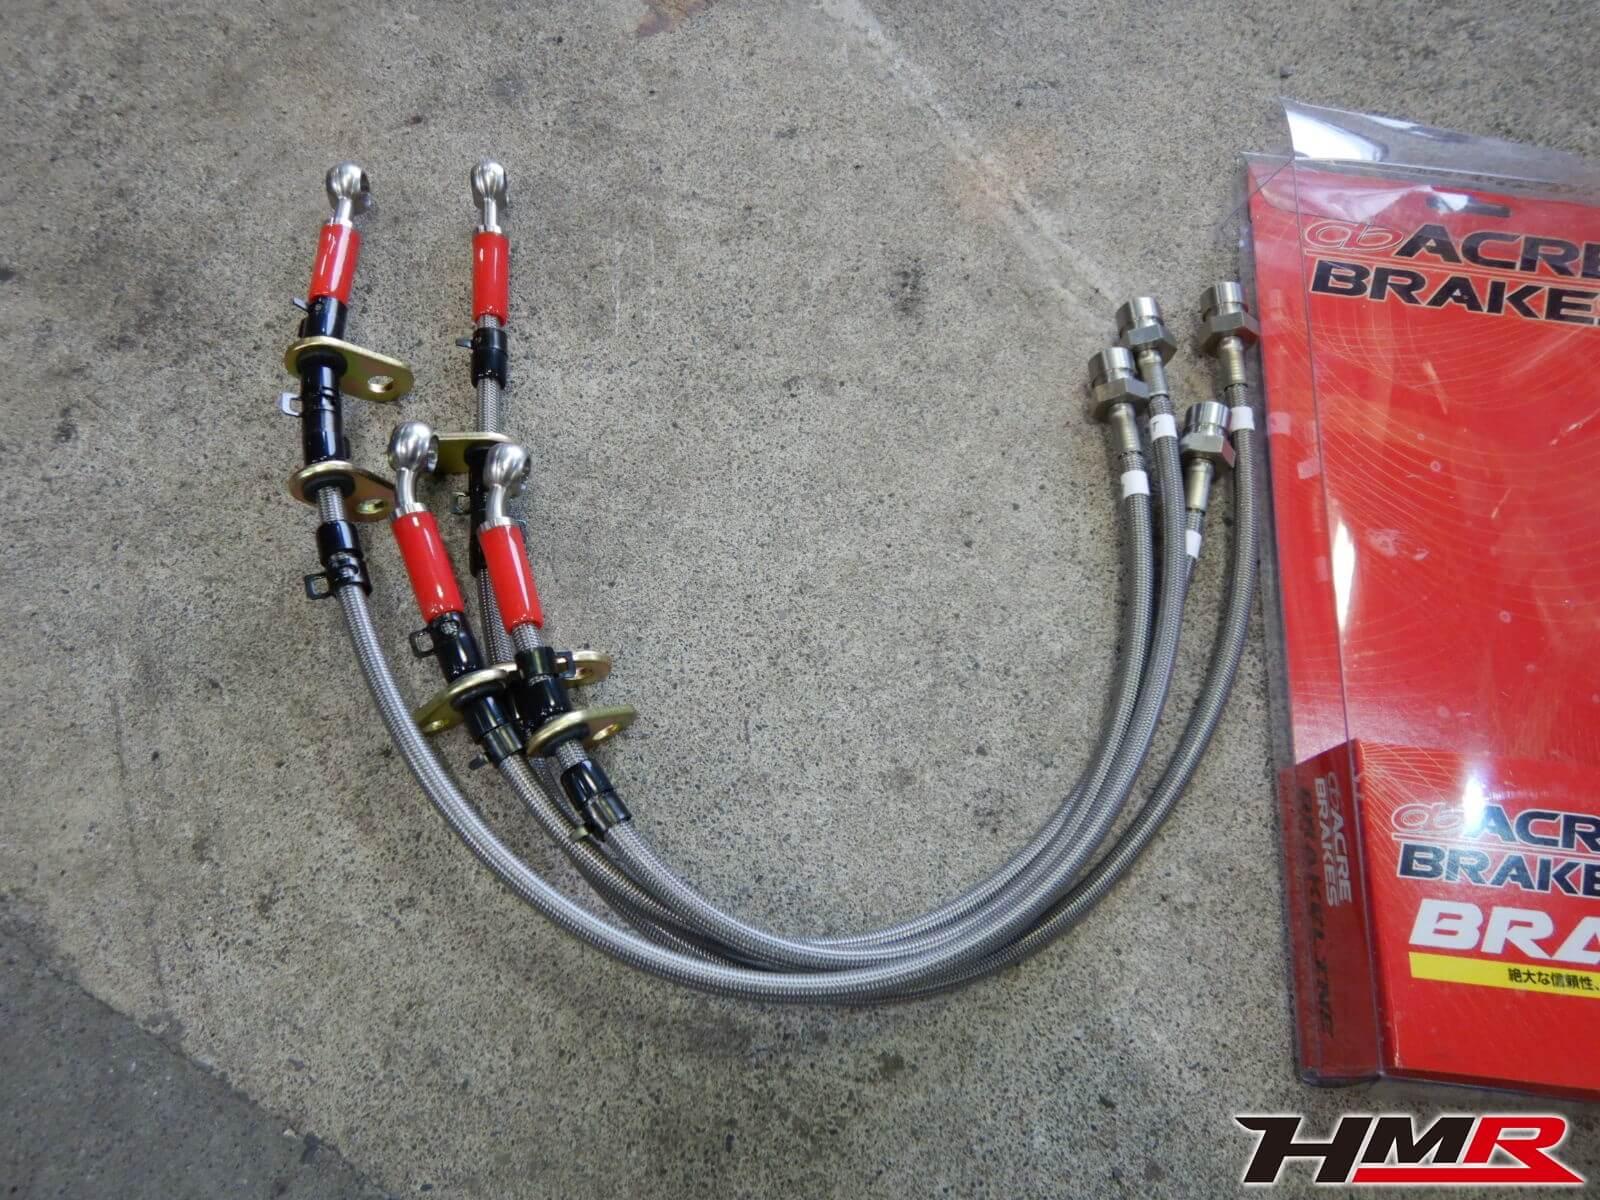 S2000 AP1 ブレーキオーバーホール